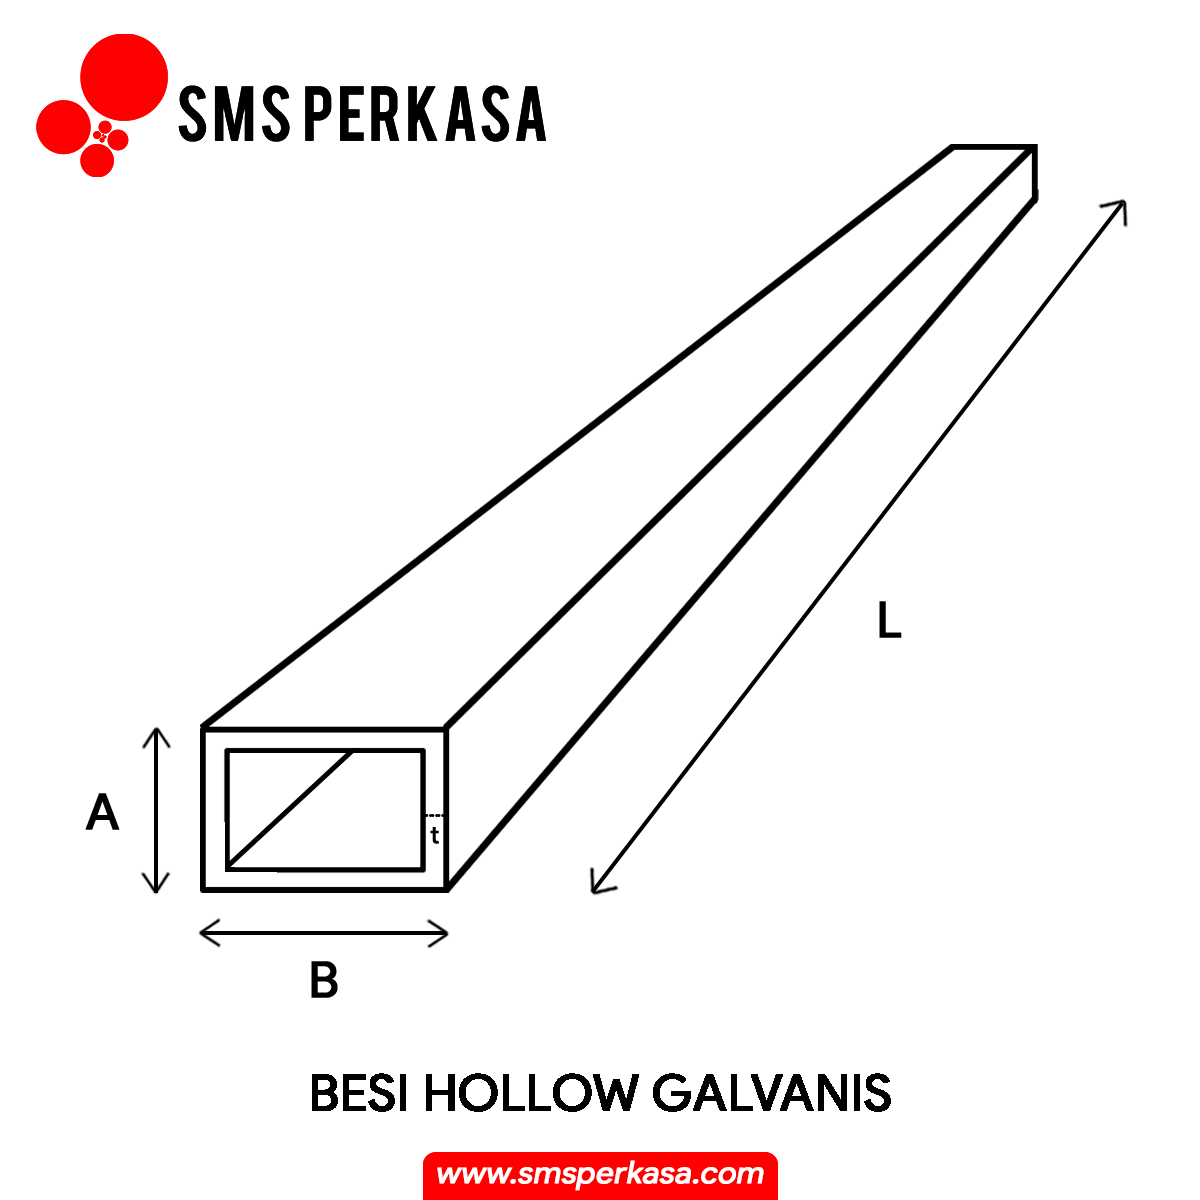 Hollow Galvanis: Harga, Ukuran, dan Berat   SMS Perkasa